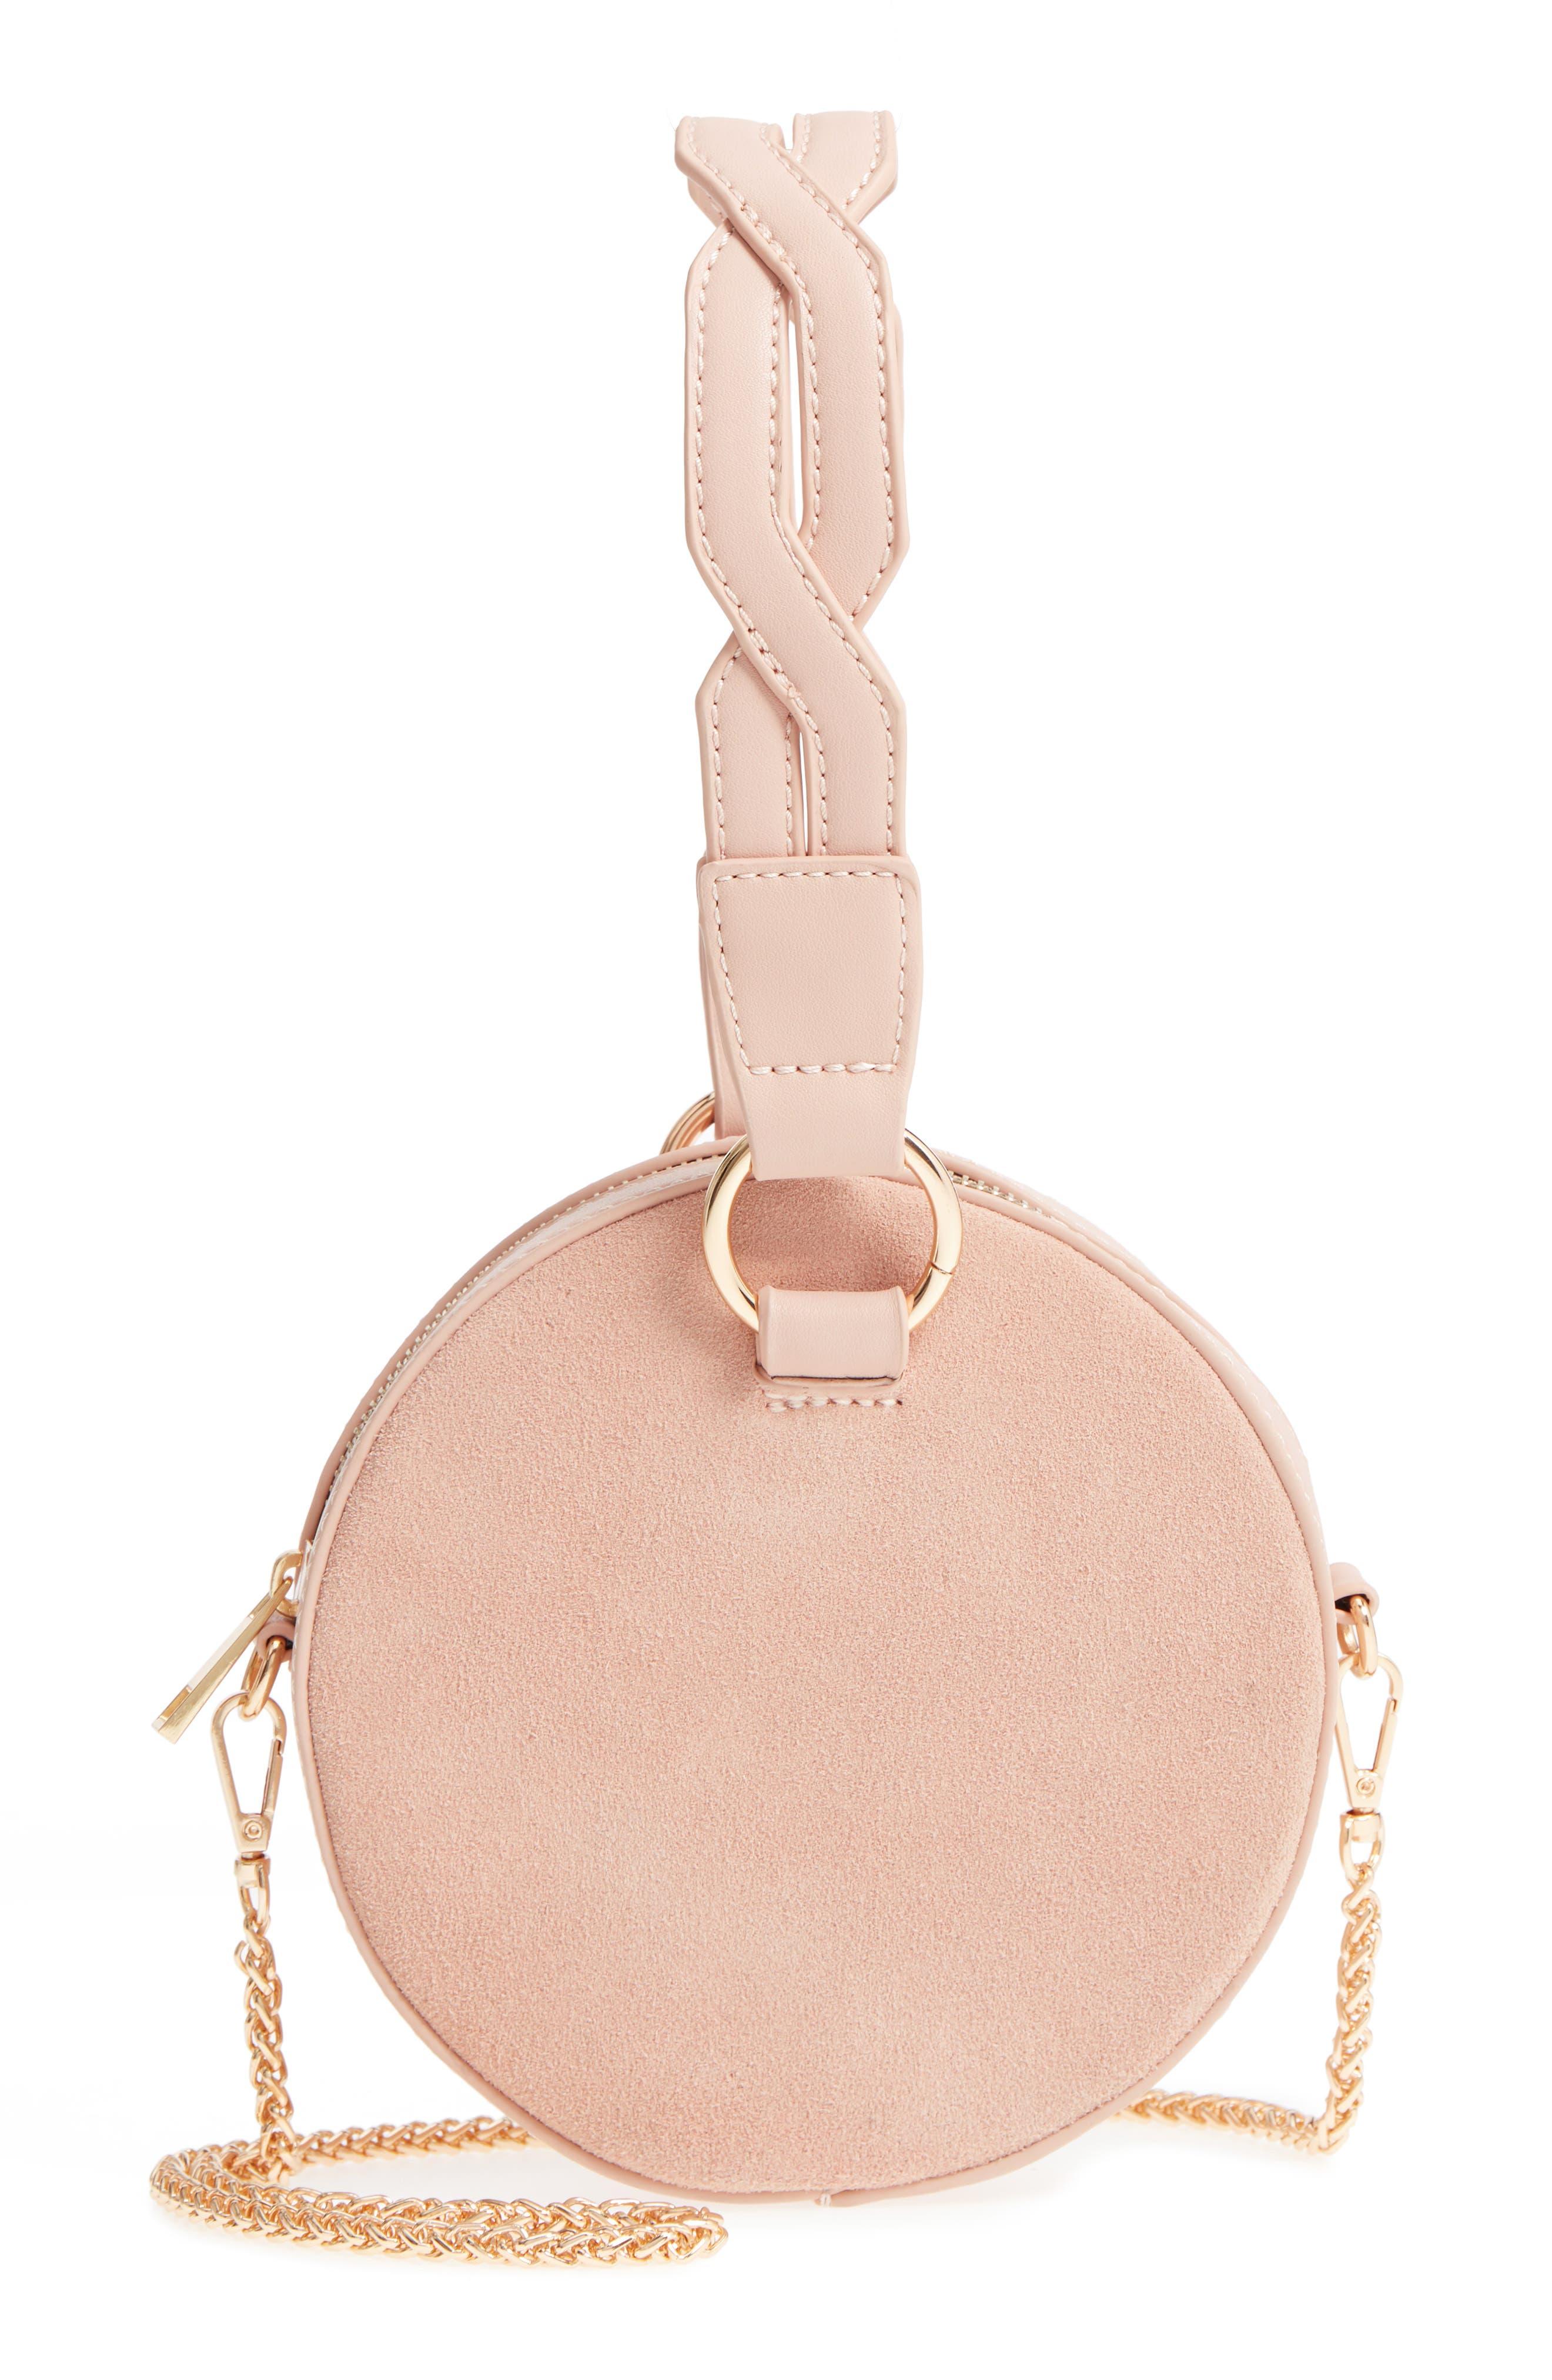 Circle Bag with Wristlet,                         Main,                         color, Tan